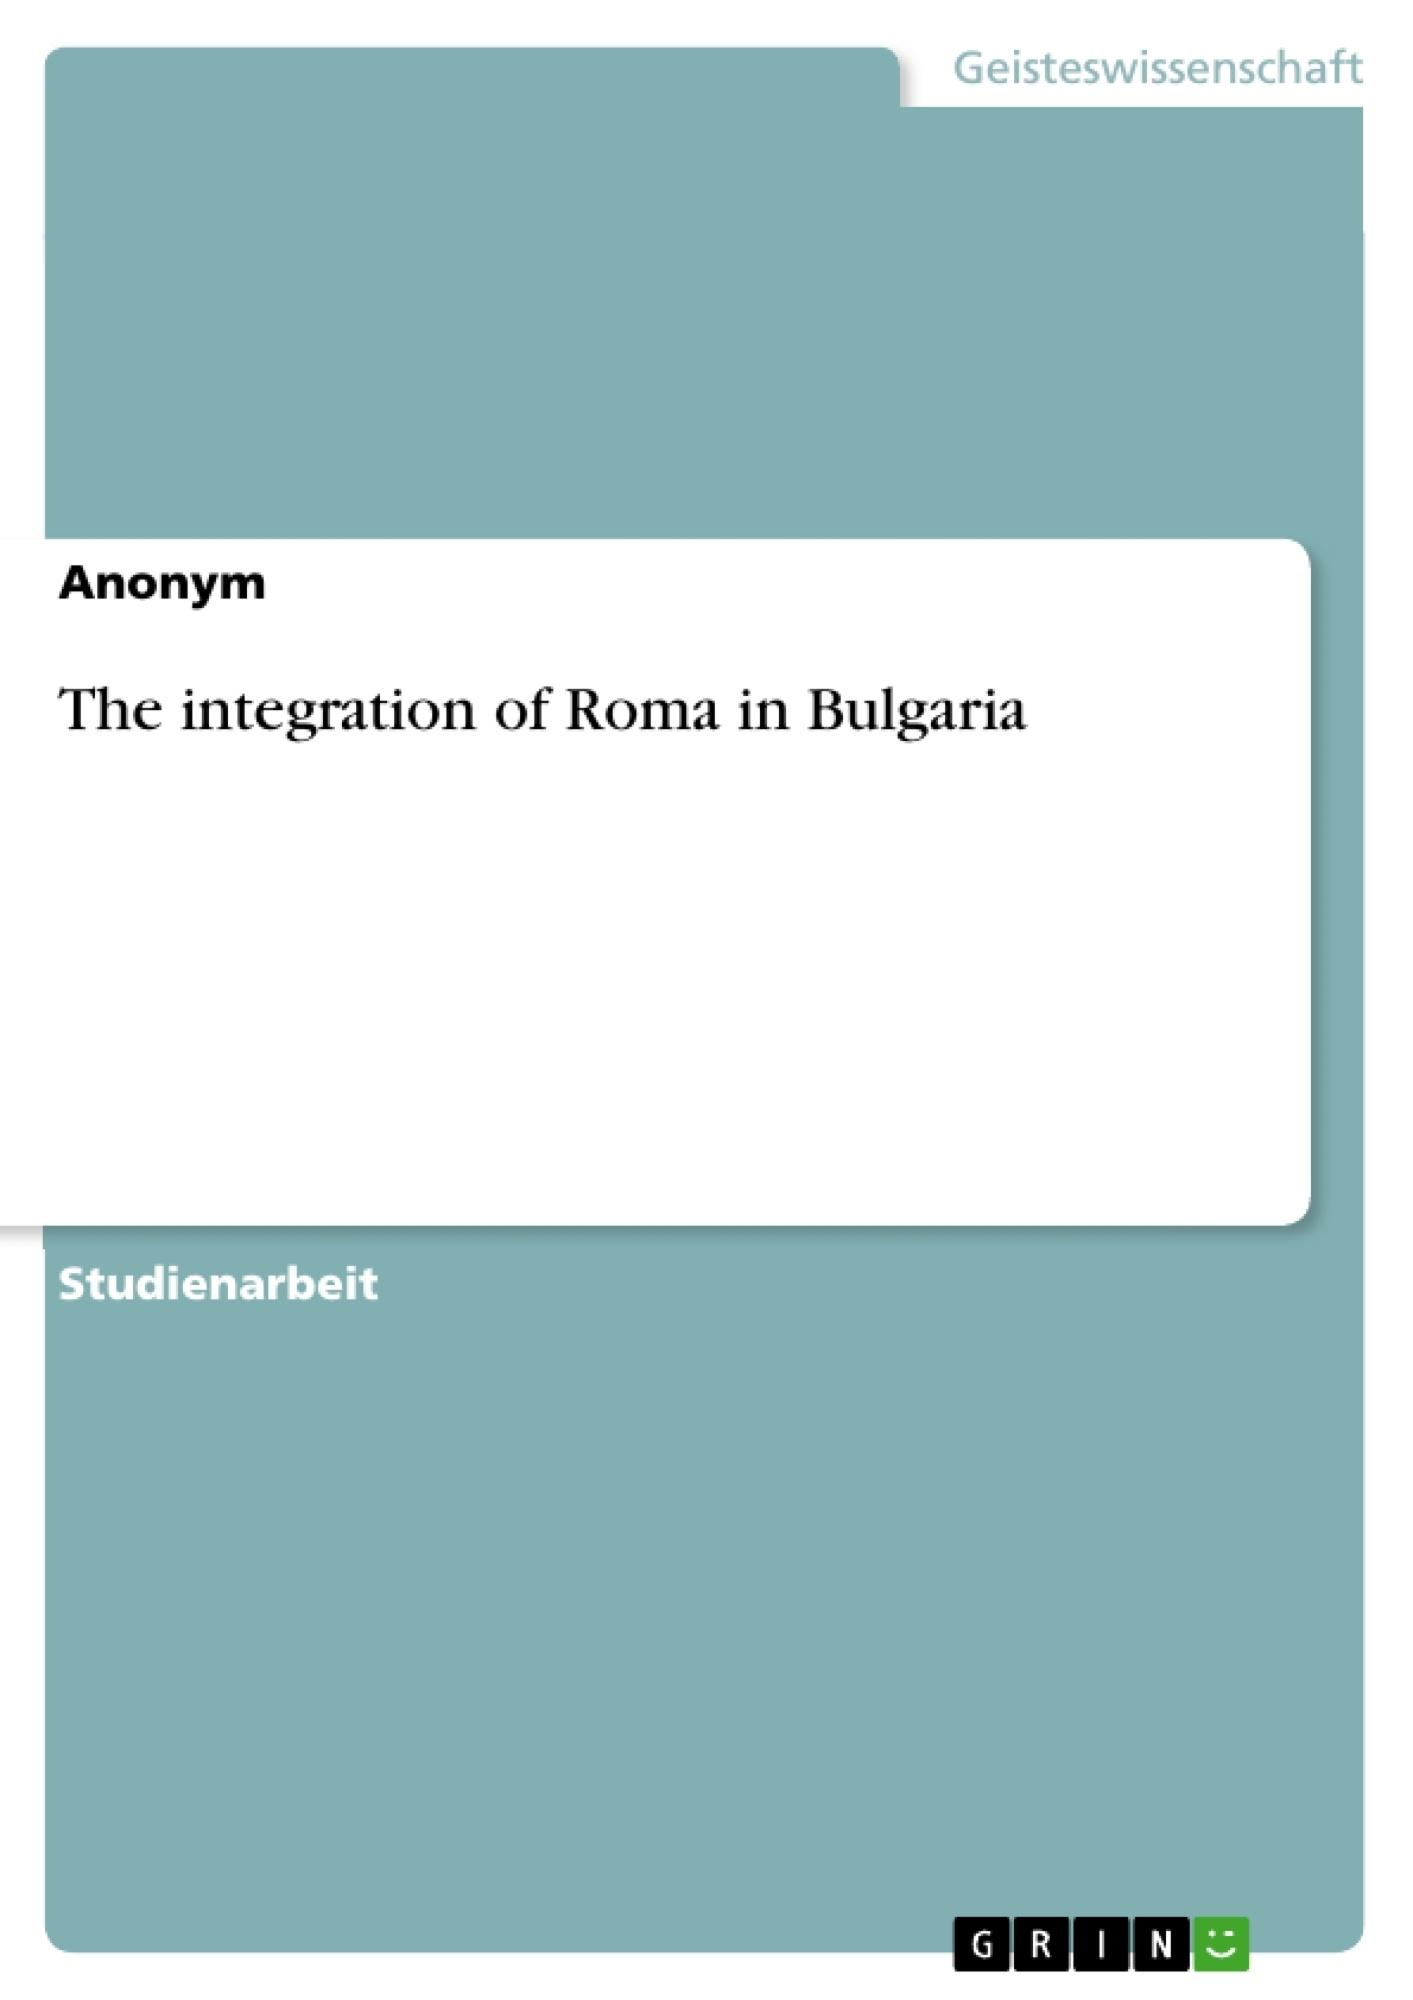 Titel: The integration of Roma in Bulgaria